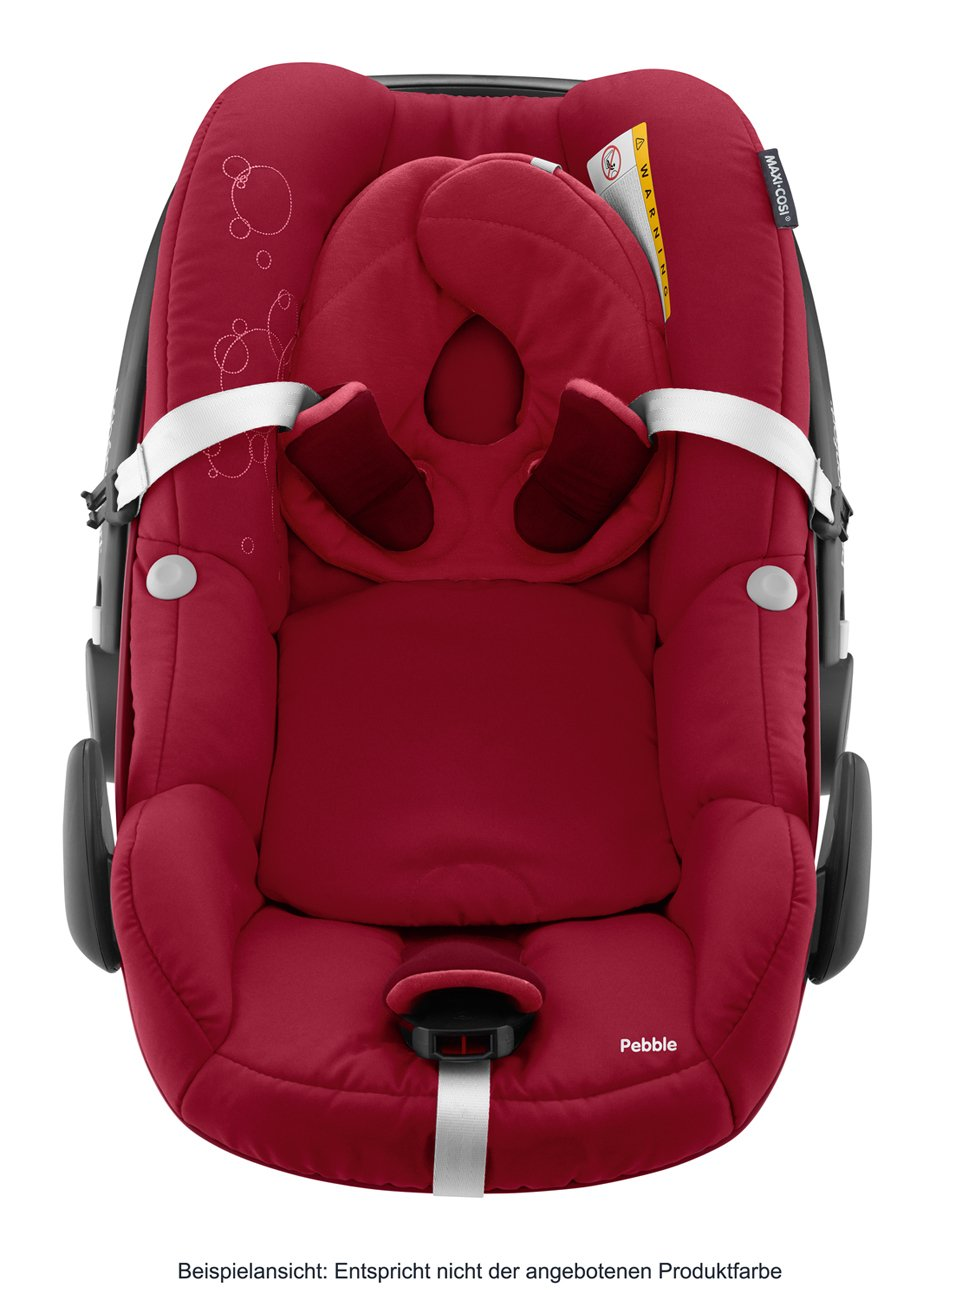 Maxi-Cosi Pebble Child's Car Seat Group 0 0-13 kg Maxi-Cosi  28